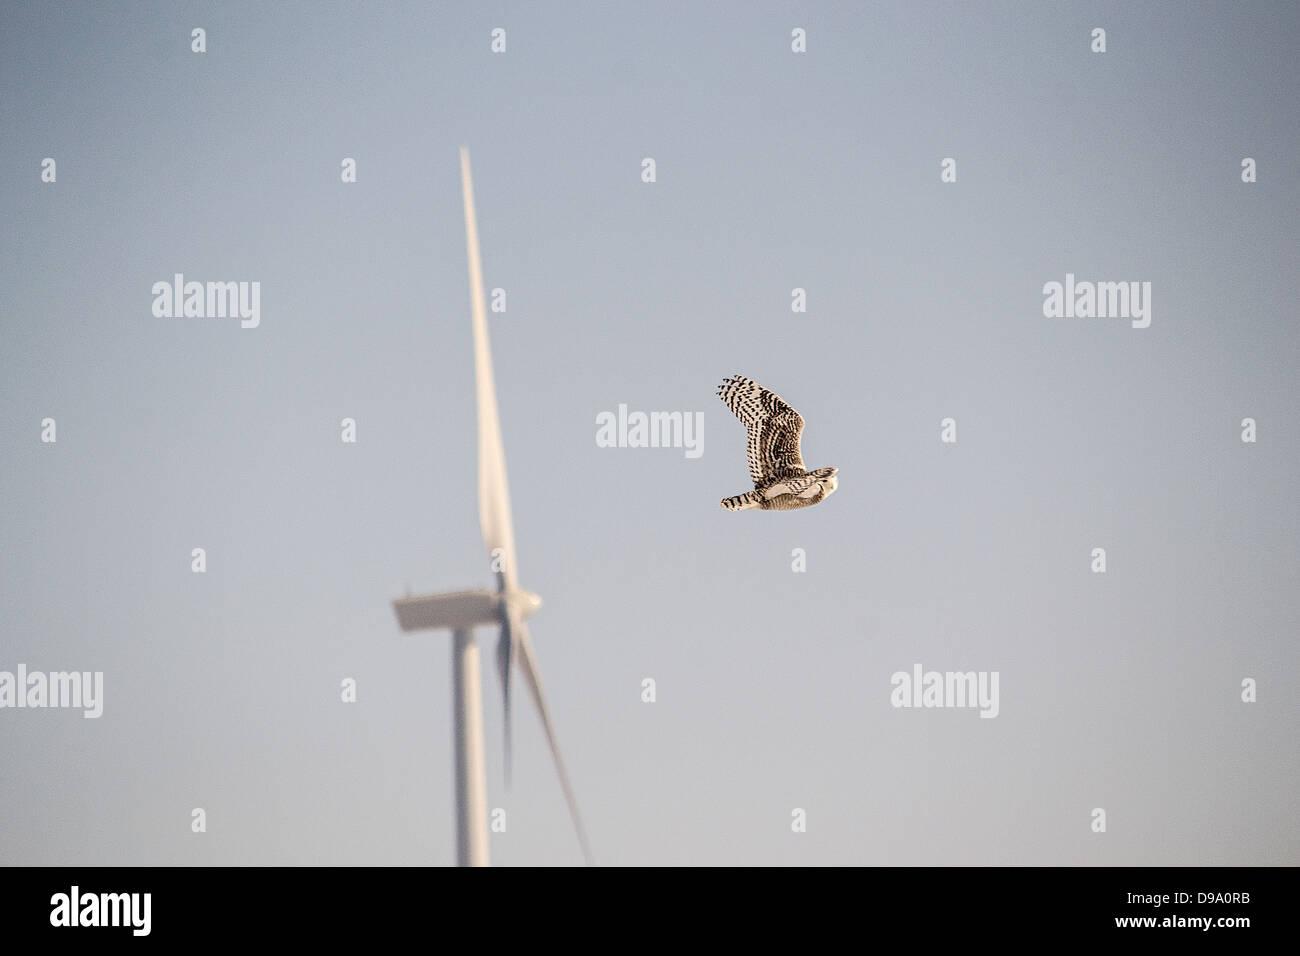 Snowy owl, wind, green, power, turbine, inventive, landscape, Castor, Alberta, wind project, clean energy, energy - Stock Image